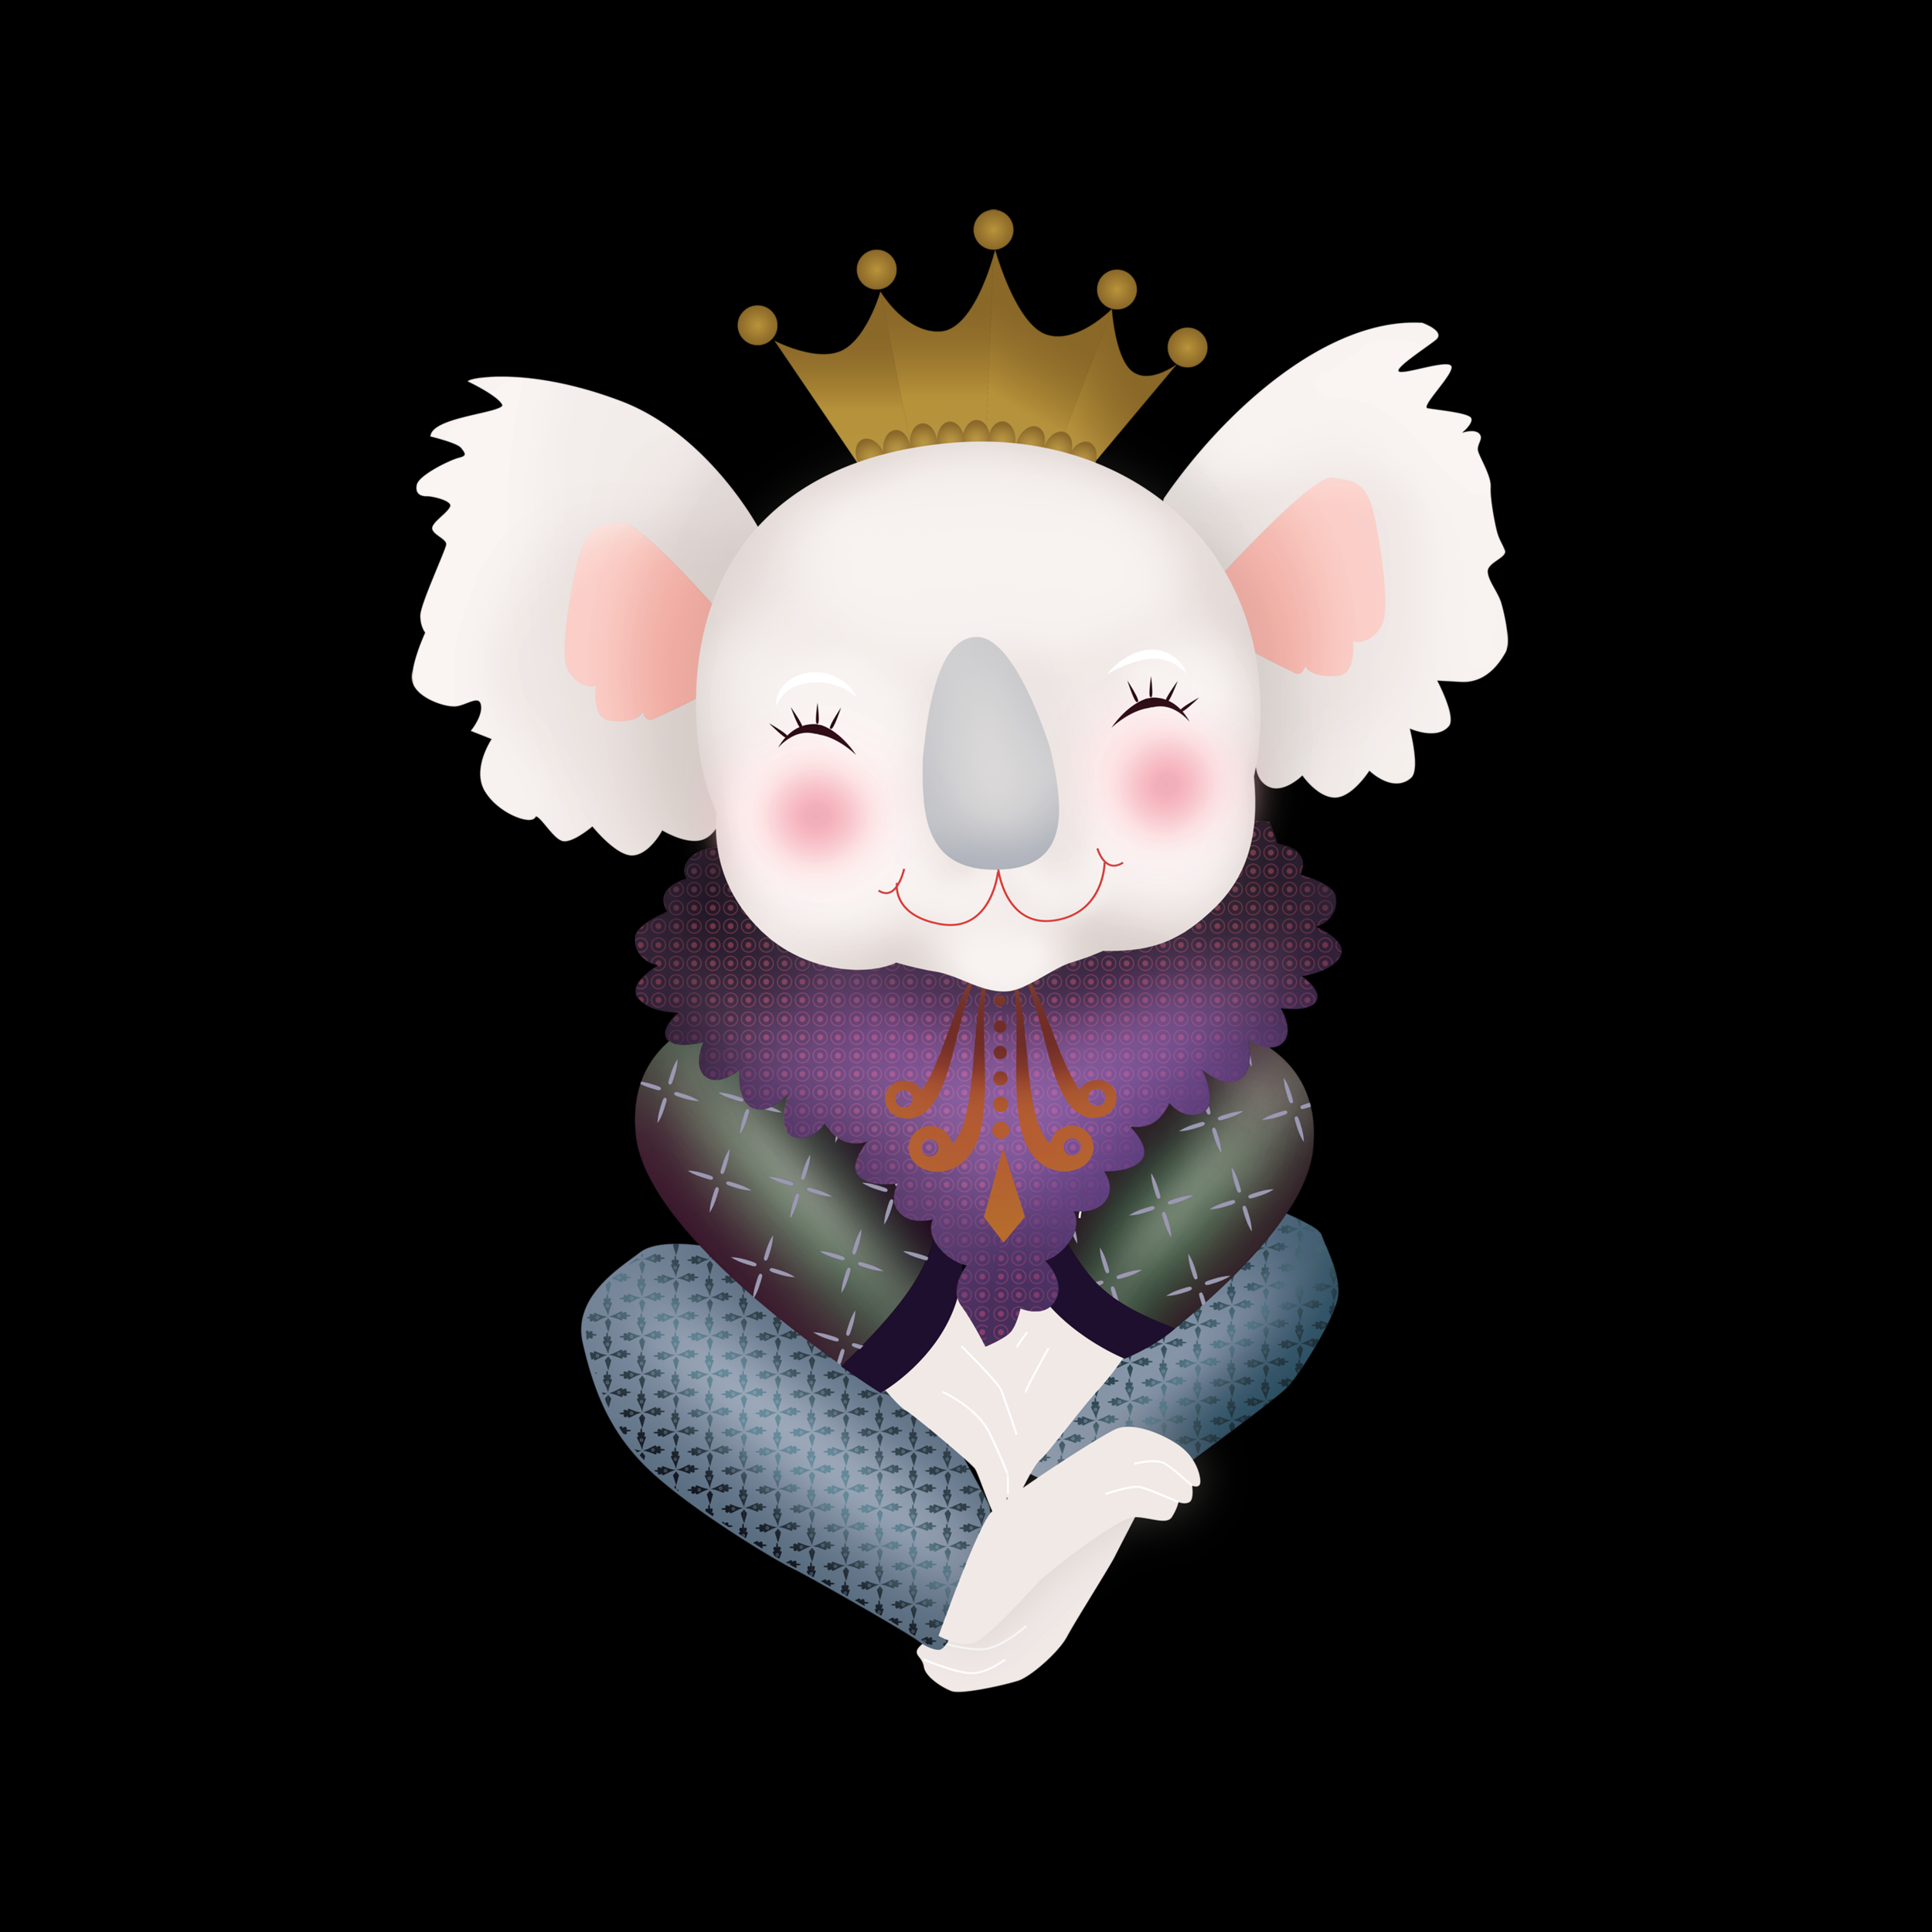 KoalaGirl_v1+2.png